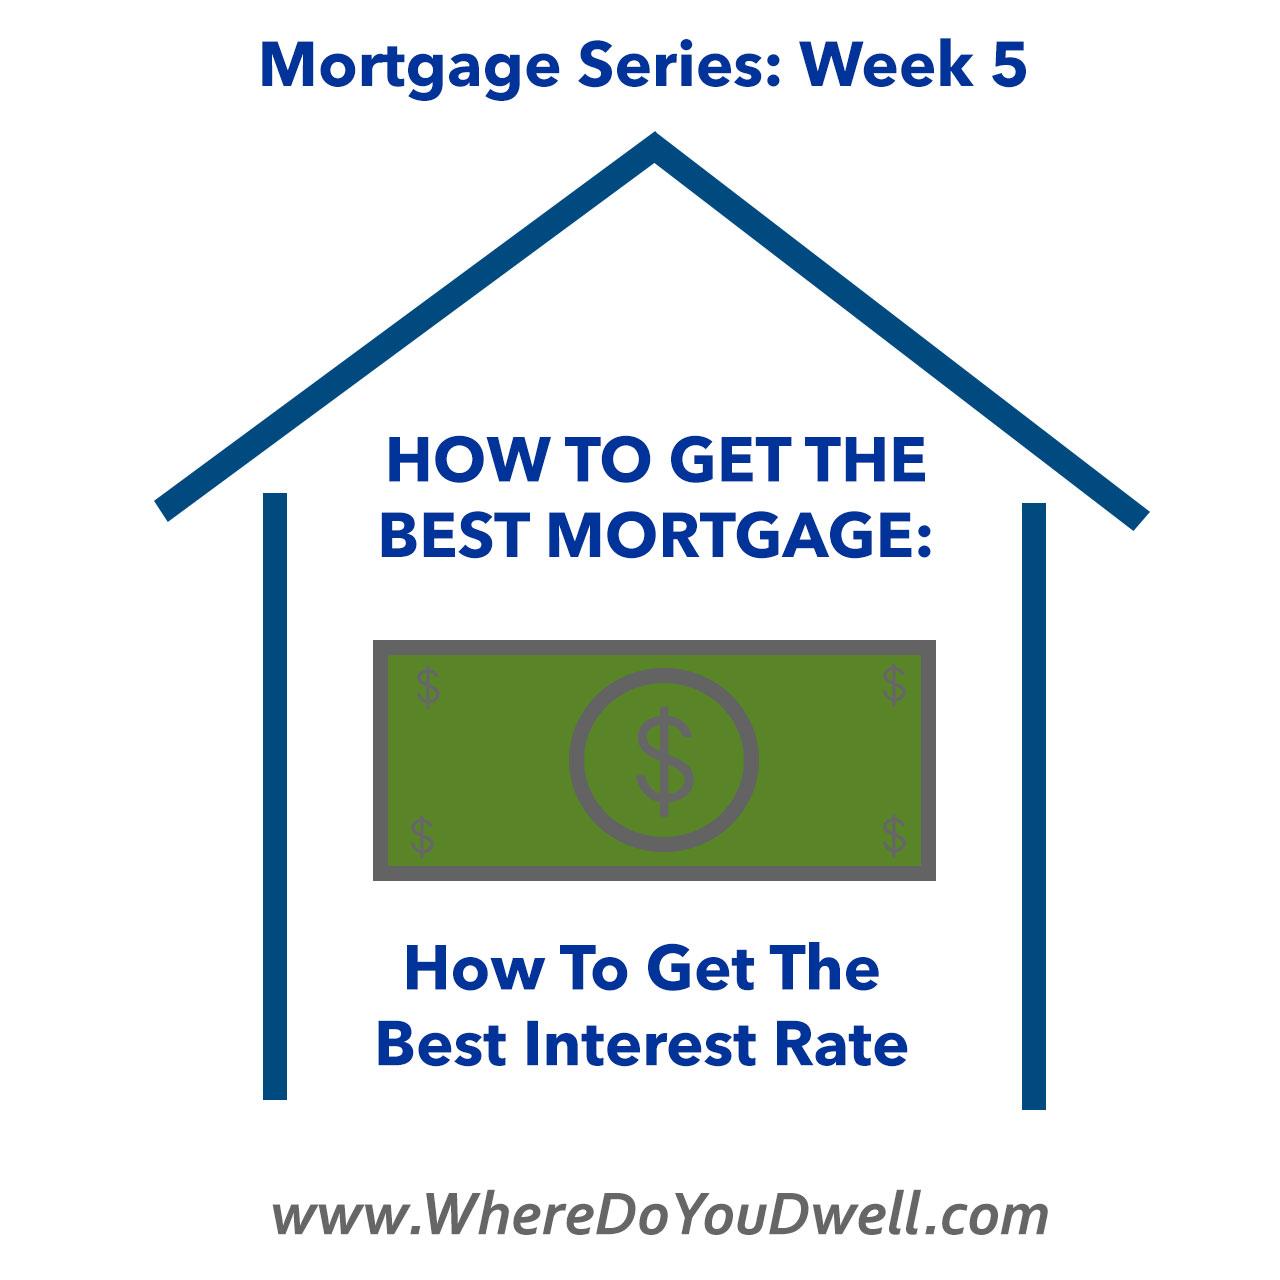 mortgageSeriesWeek5